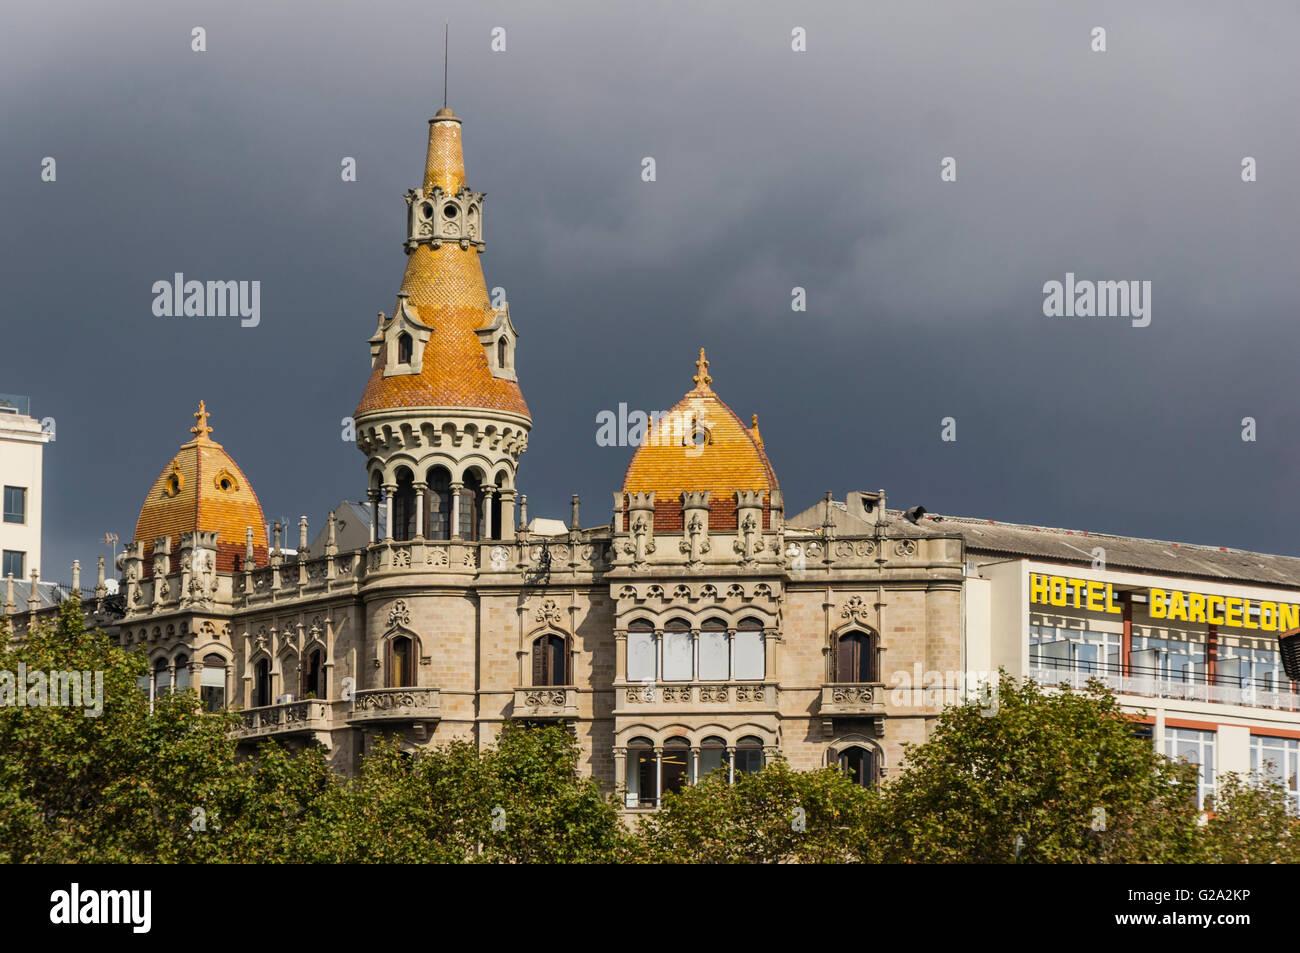 Cases Rocamora, Teatre Tivoli , theatre, Hotel Barcelona, Plaza de Catalunya Catalonia , Barcelona, Catalonia, Spain, Stock Photo